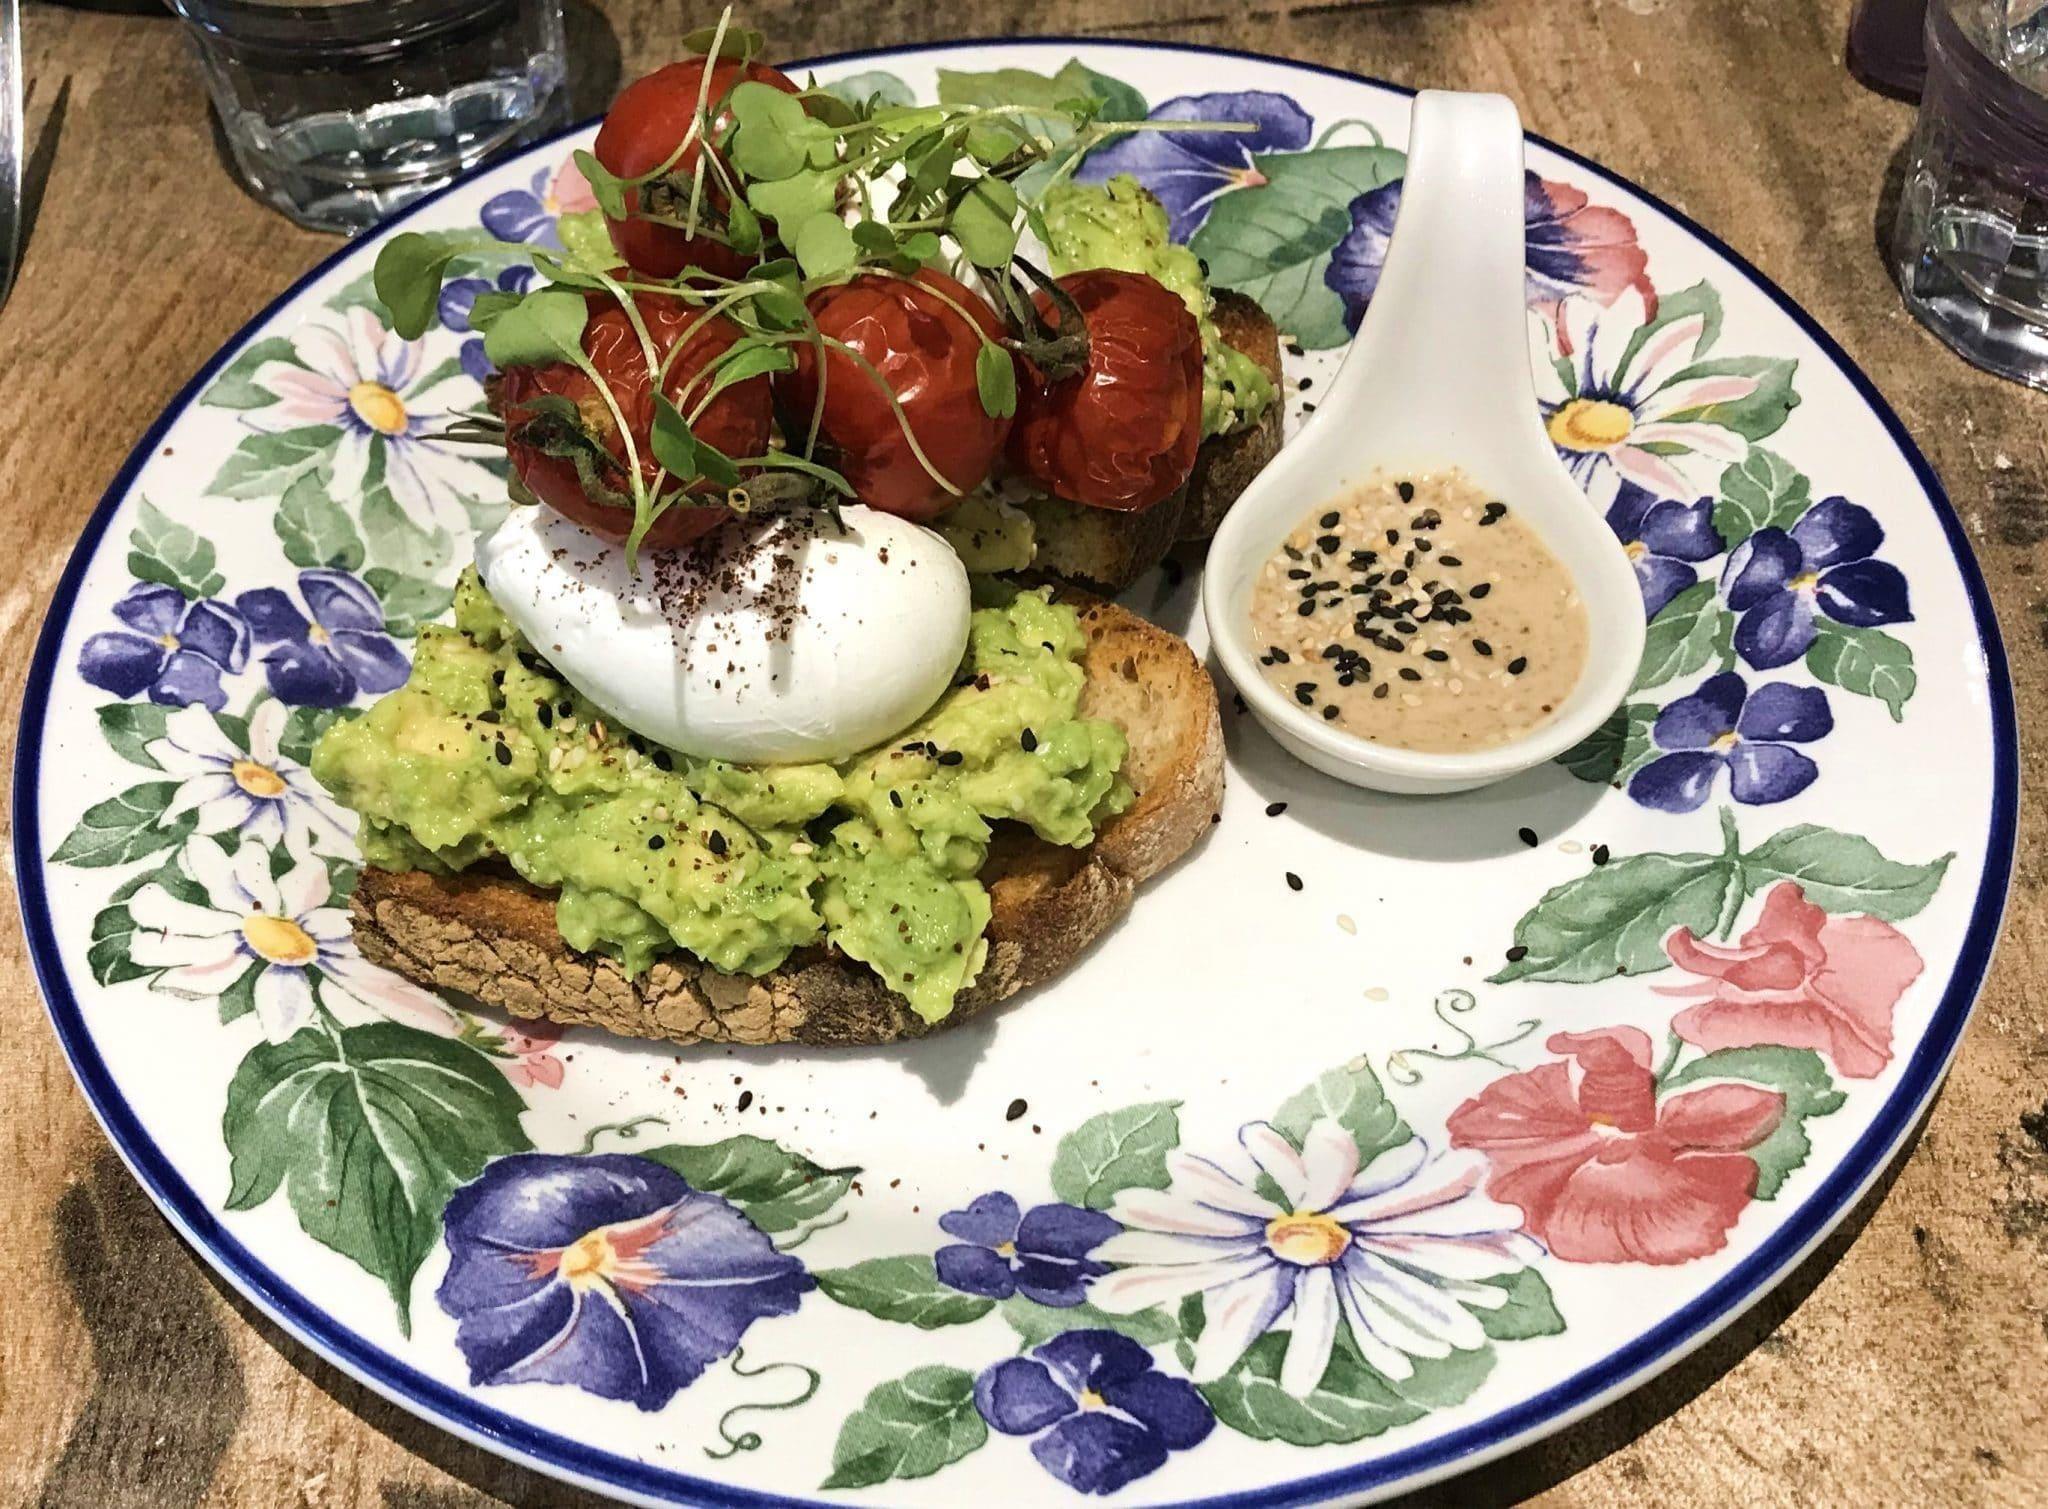 Enjoy a delicious brunch at Lowry & Baker near in Portobello Road